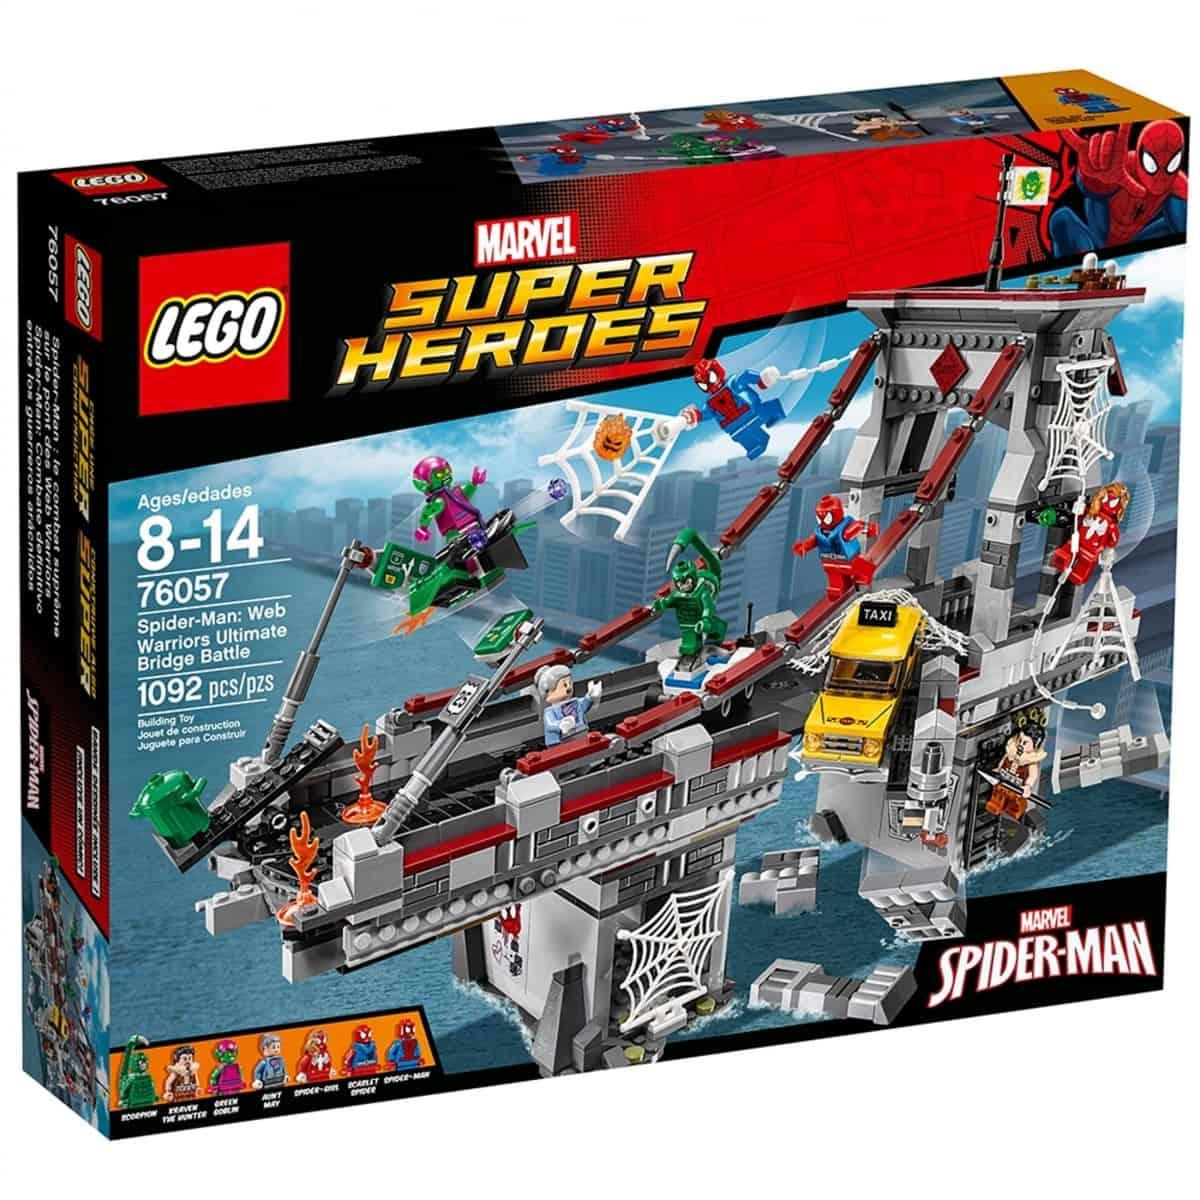 lego 76057 spider man web warriors ultimate bridge battle scaled